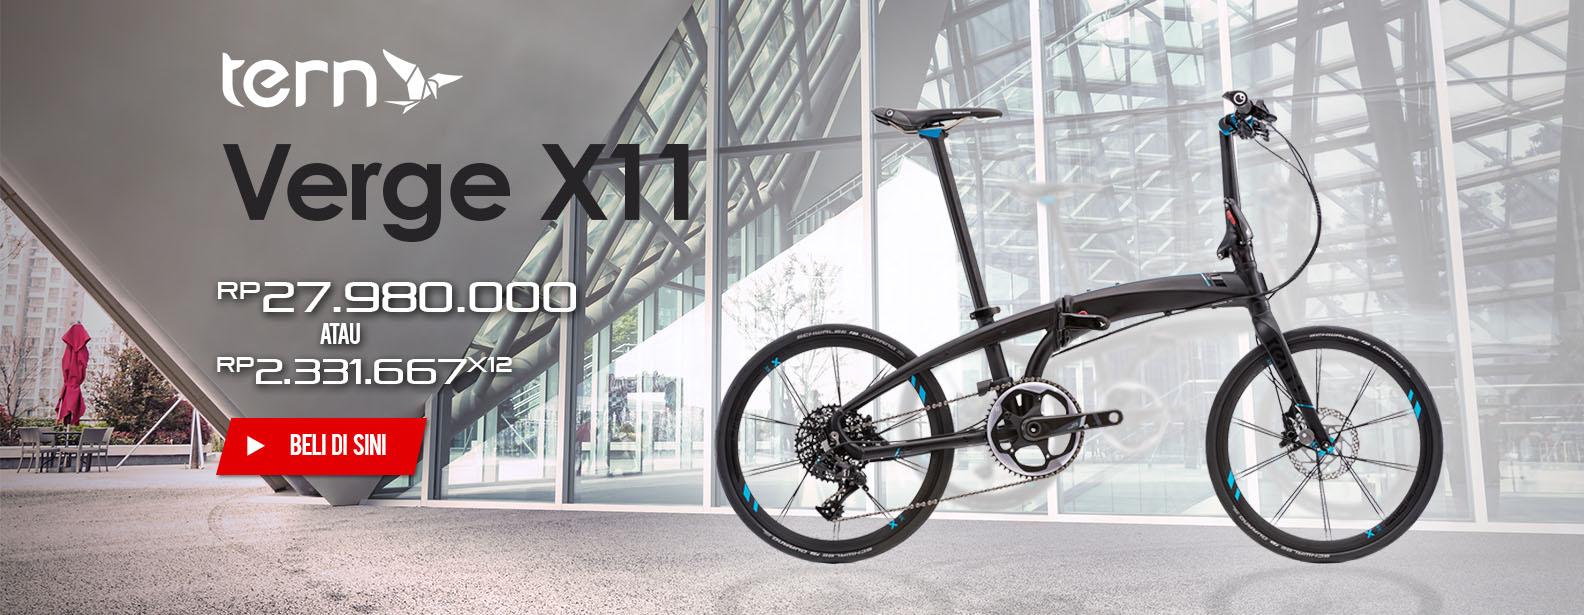 Tern Sepeda Lipat Verge X11